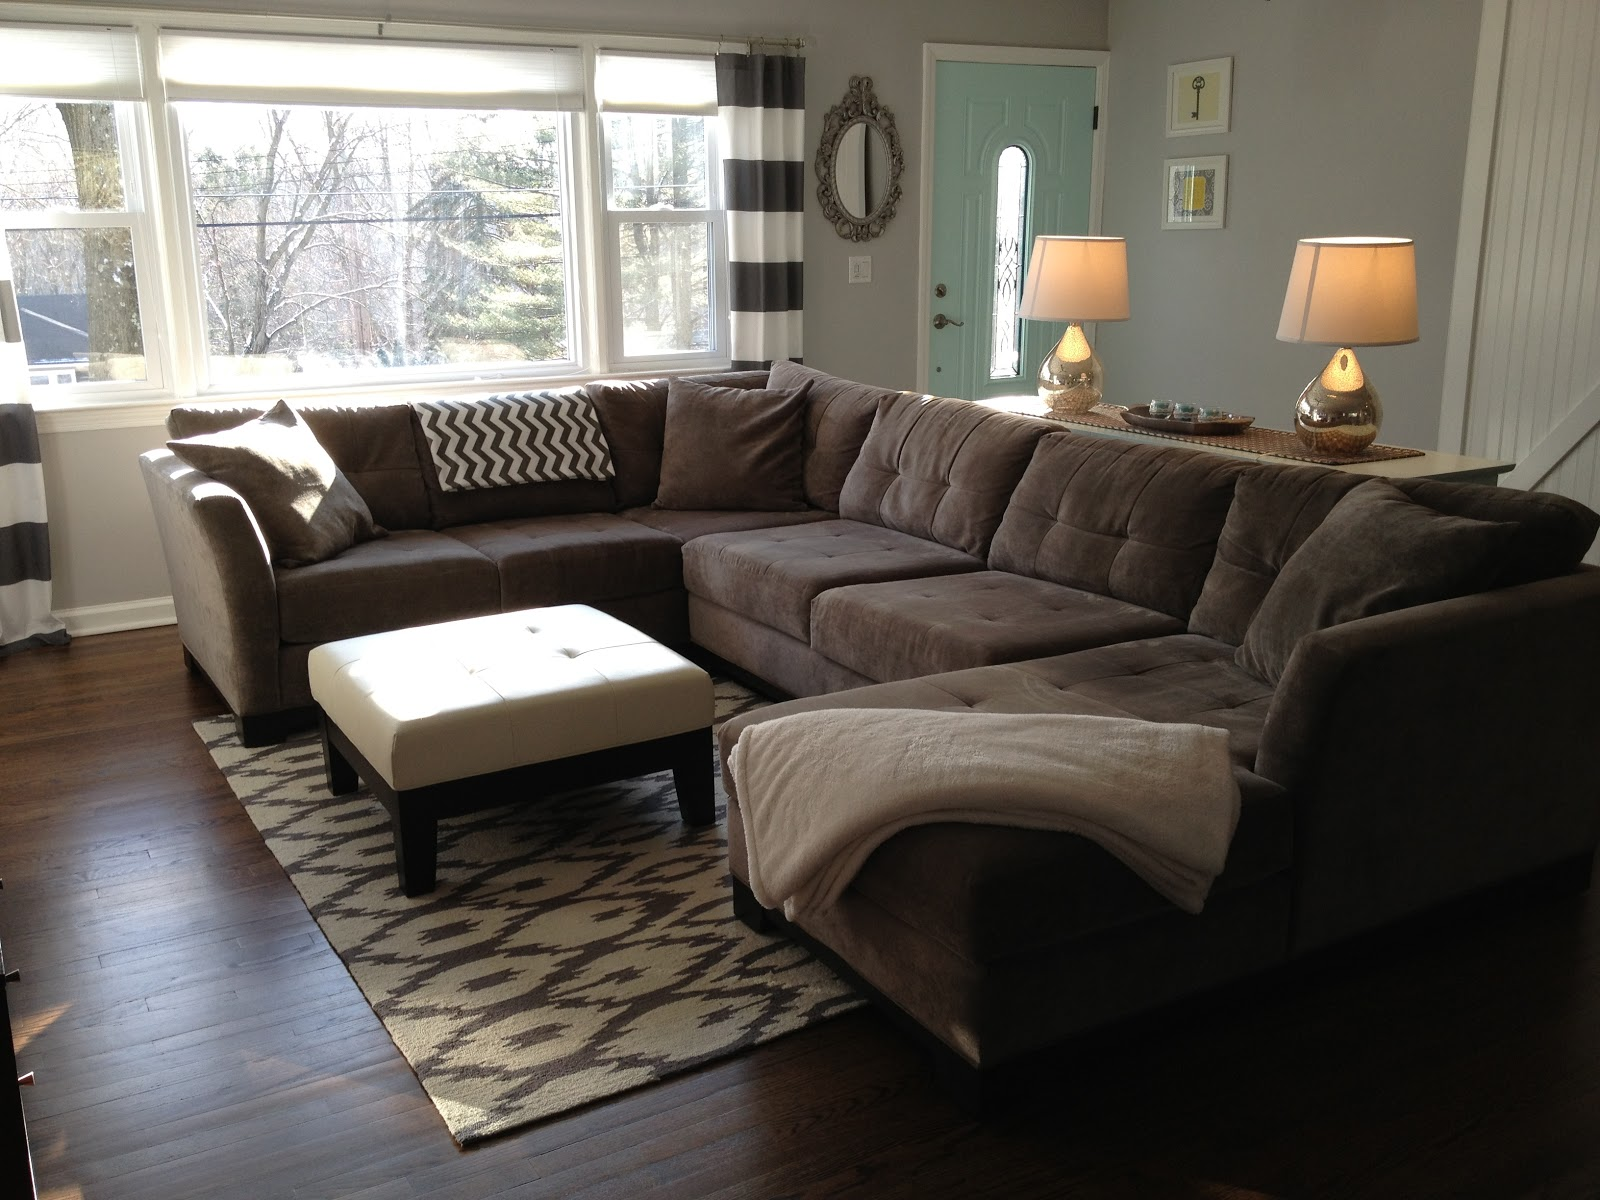 Rug Under Sofa - Rugs Ideas